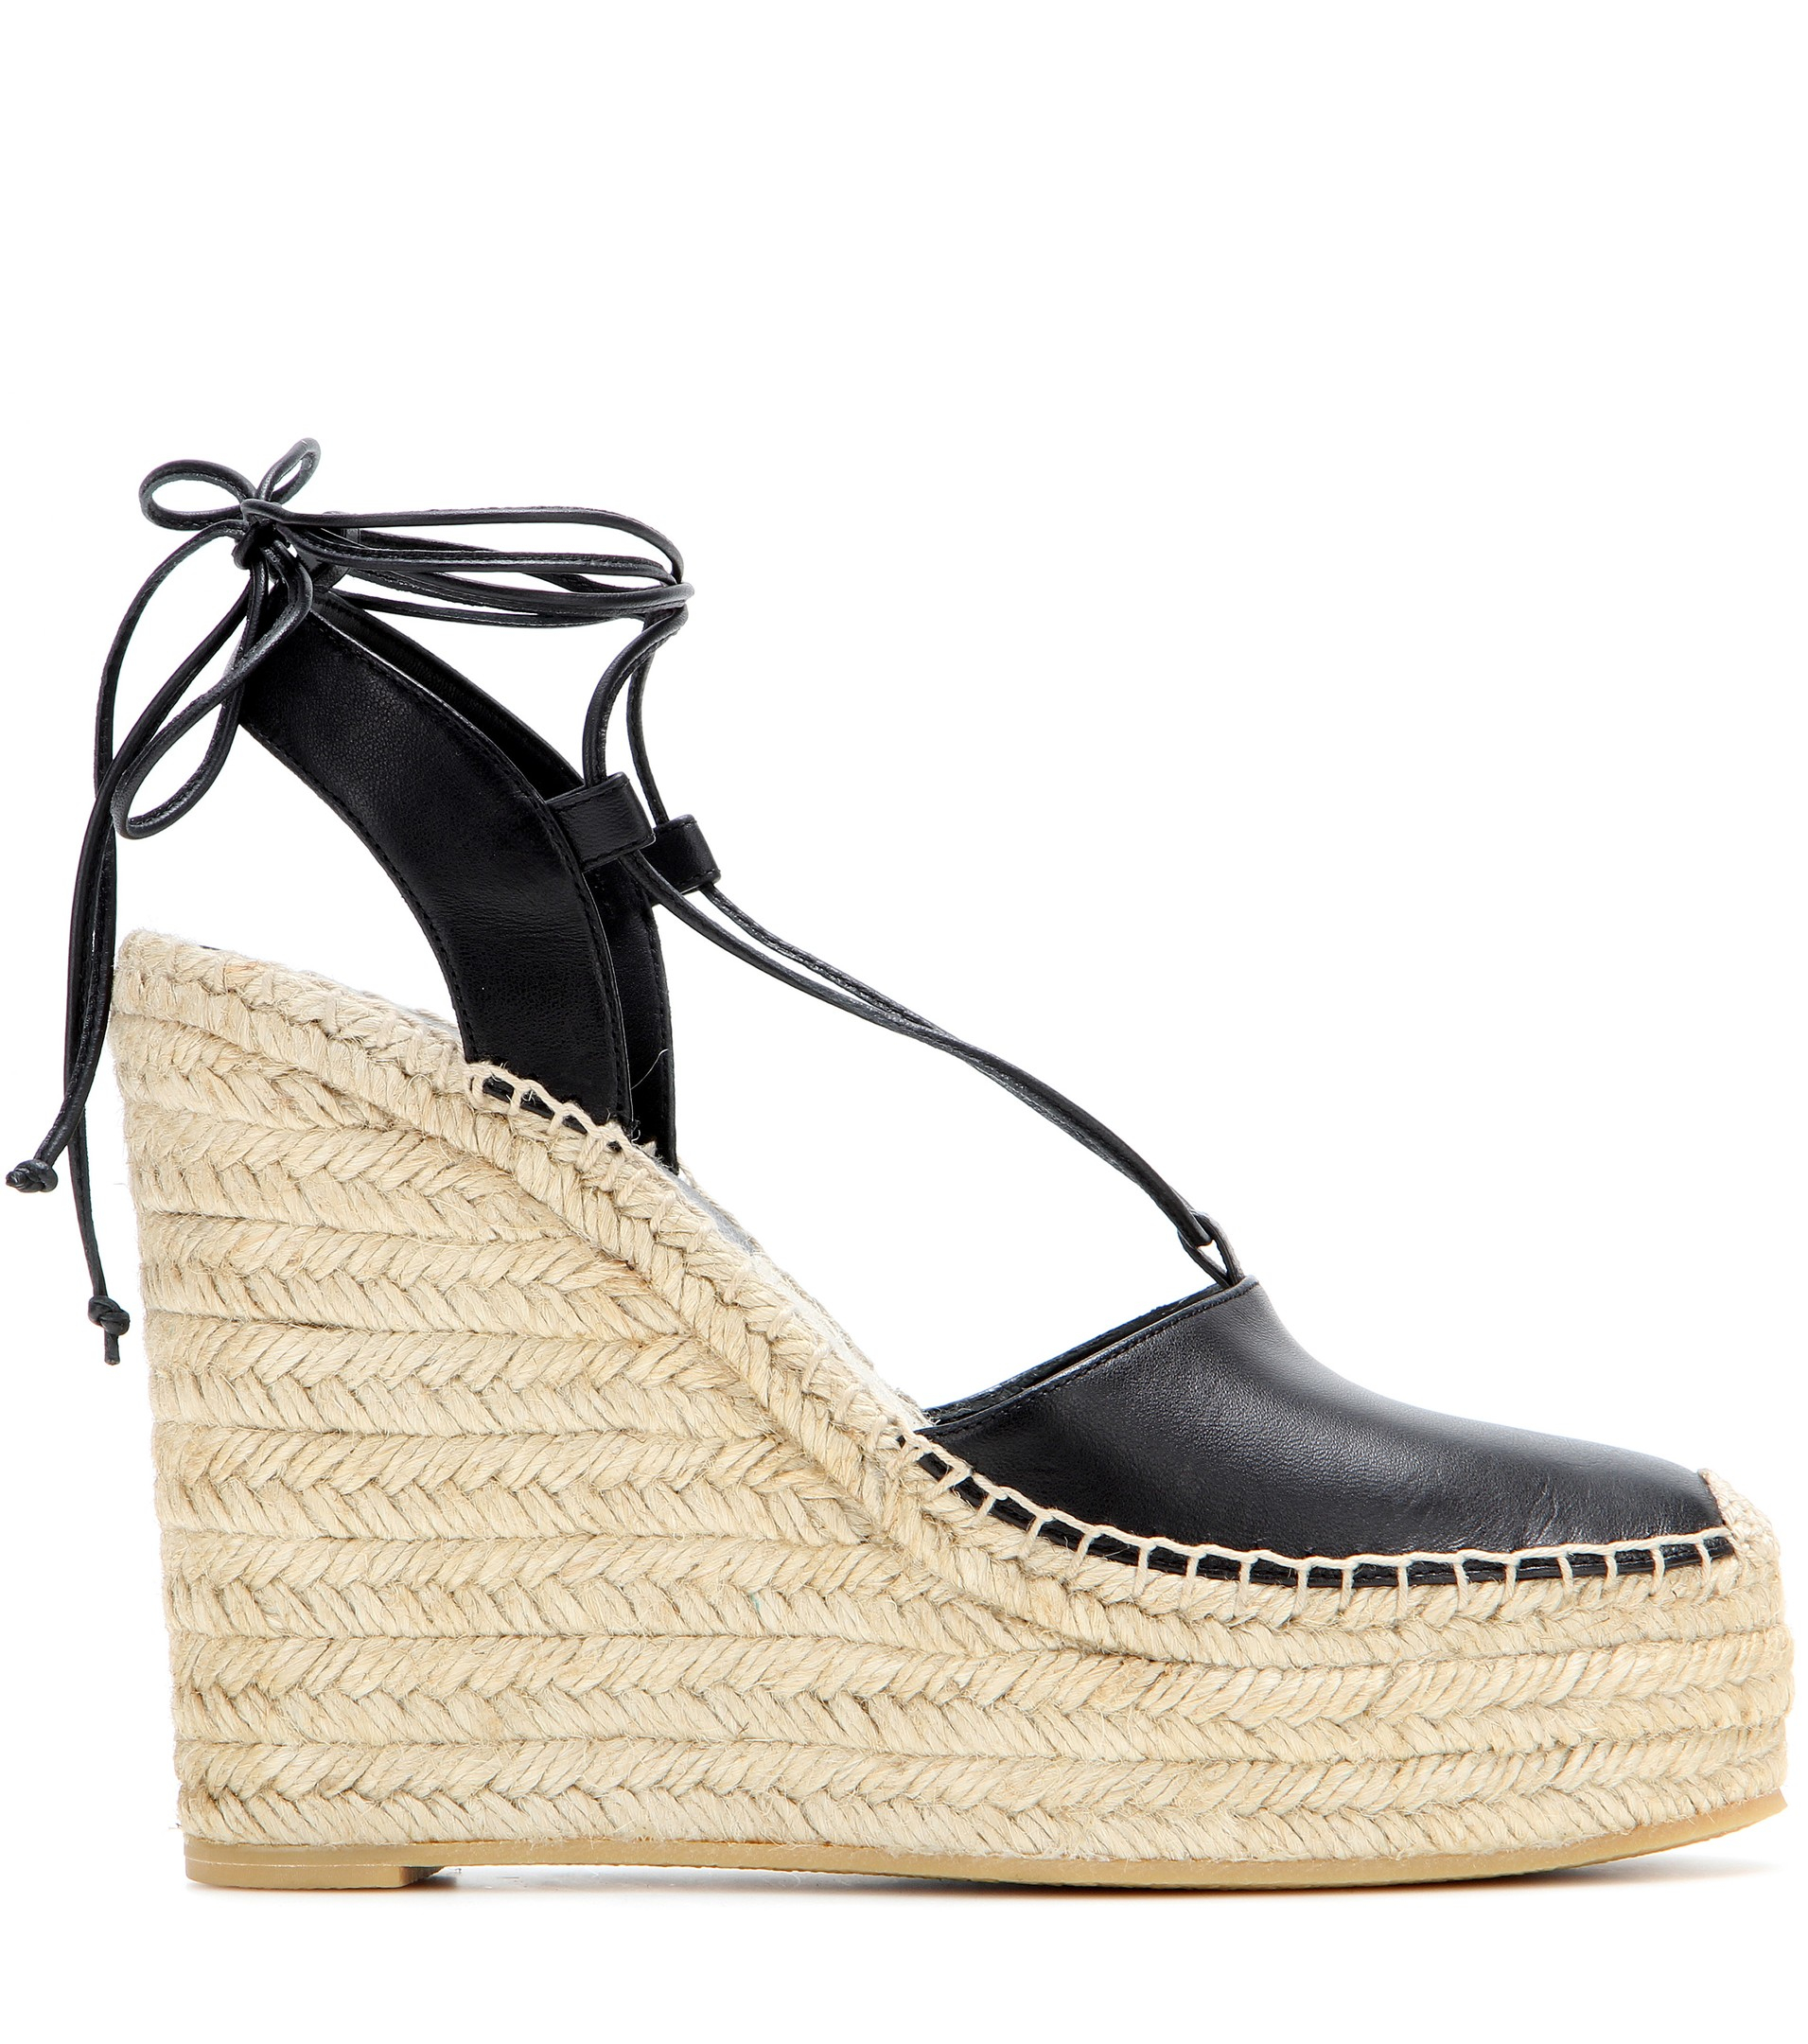 d628599c7574 Lyst - Saint Laurent Leather Espadrille Wedge Sandals in Natural